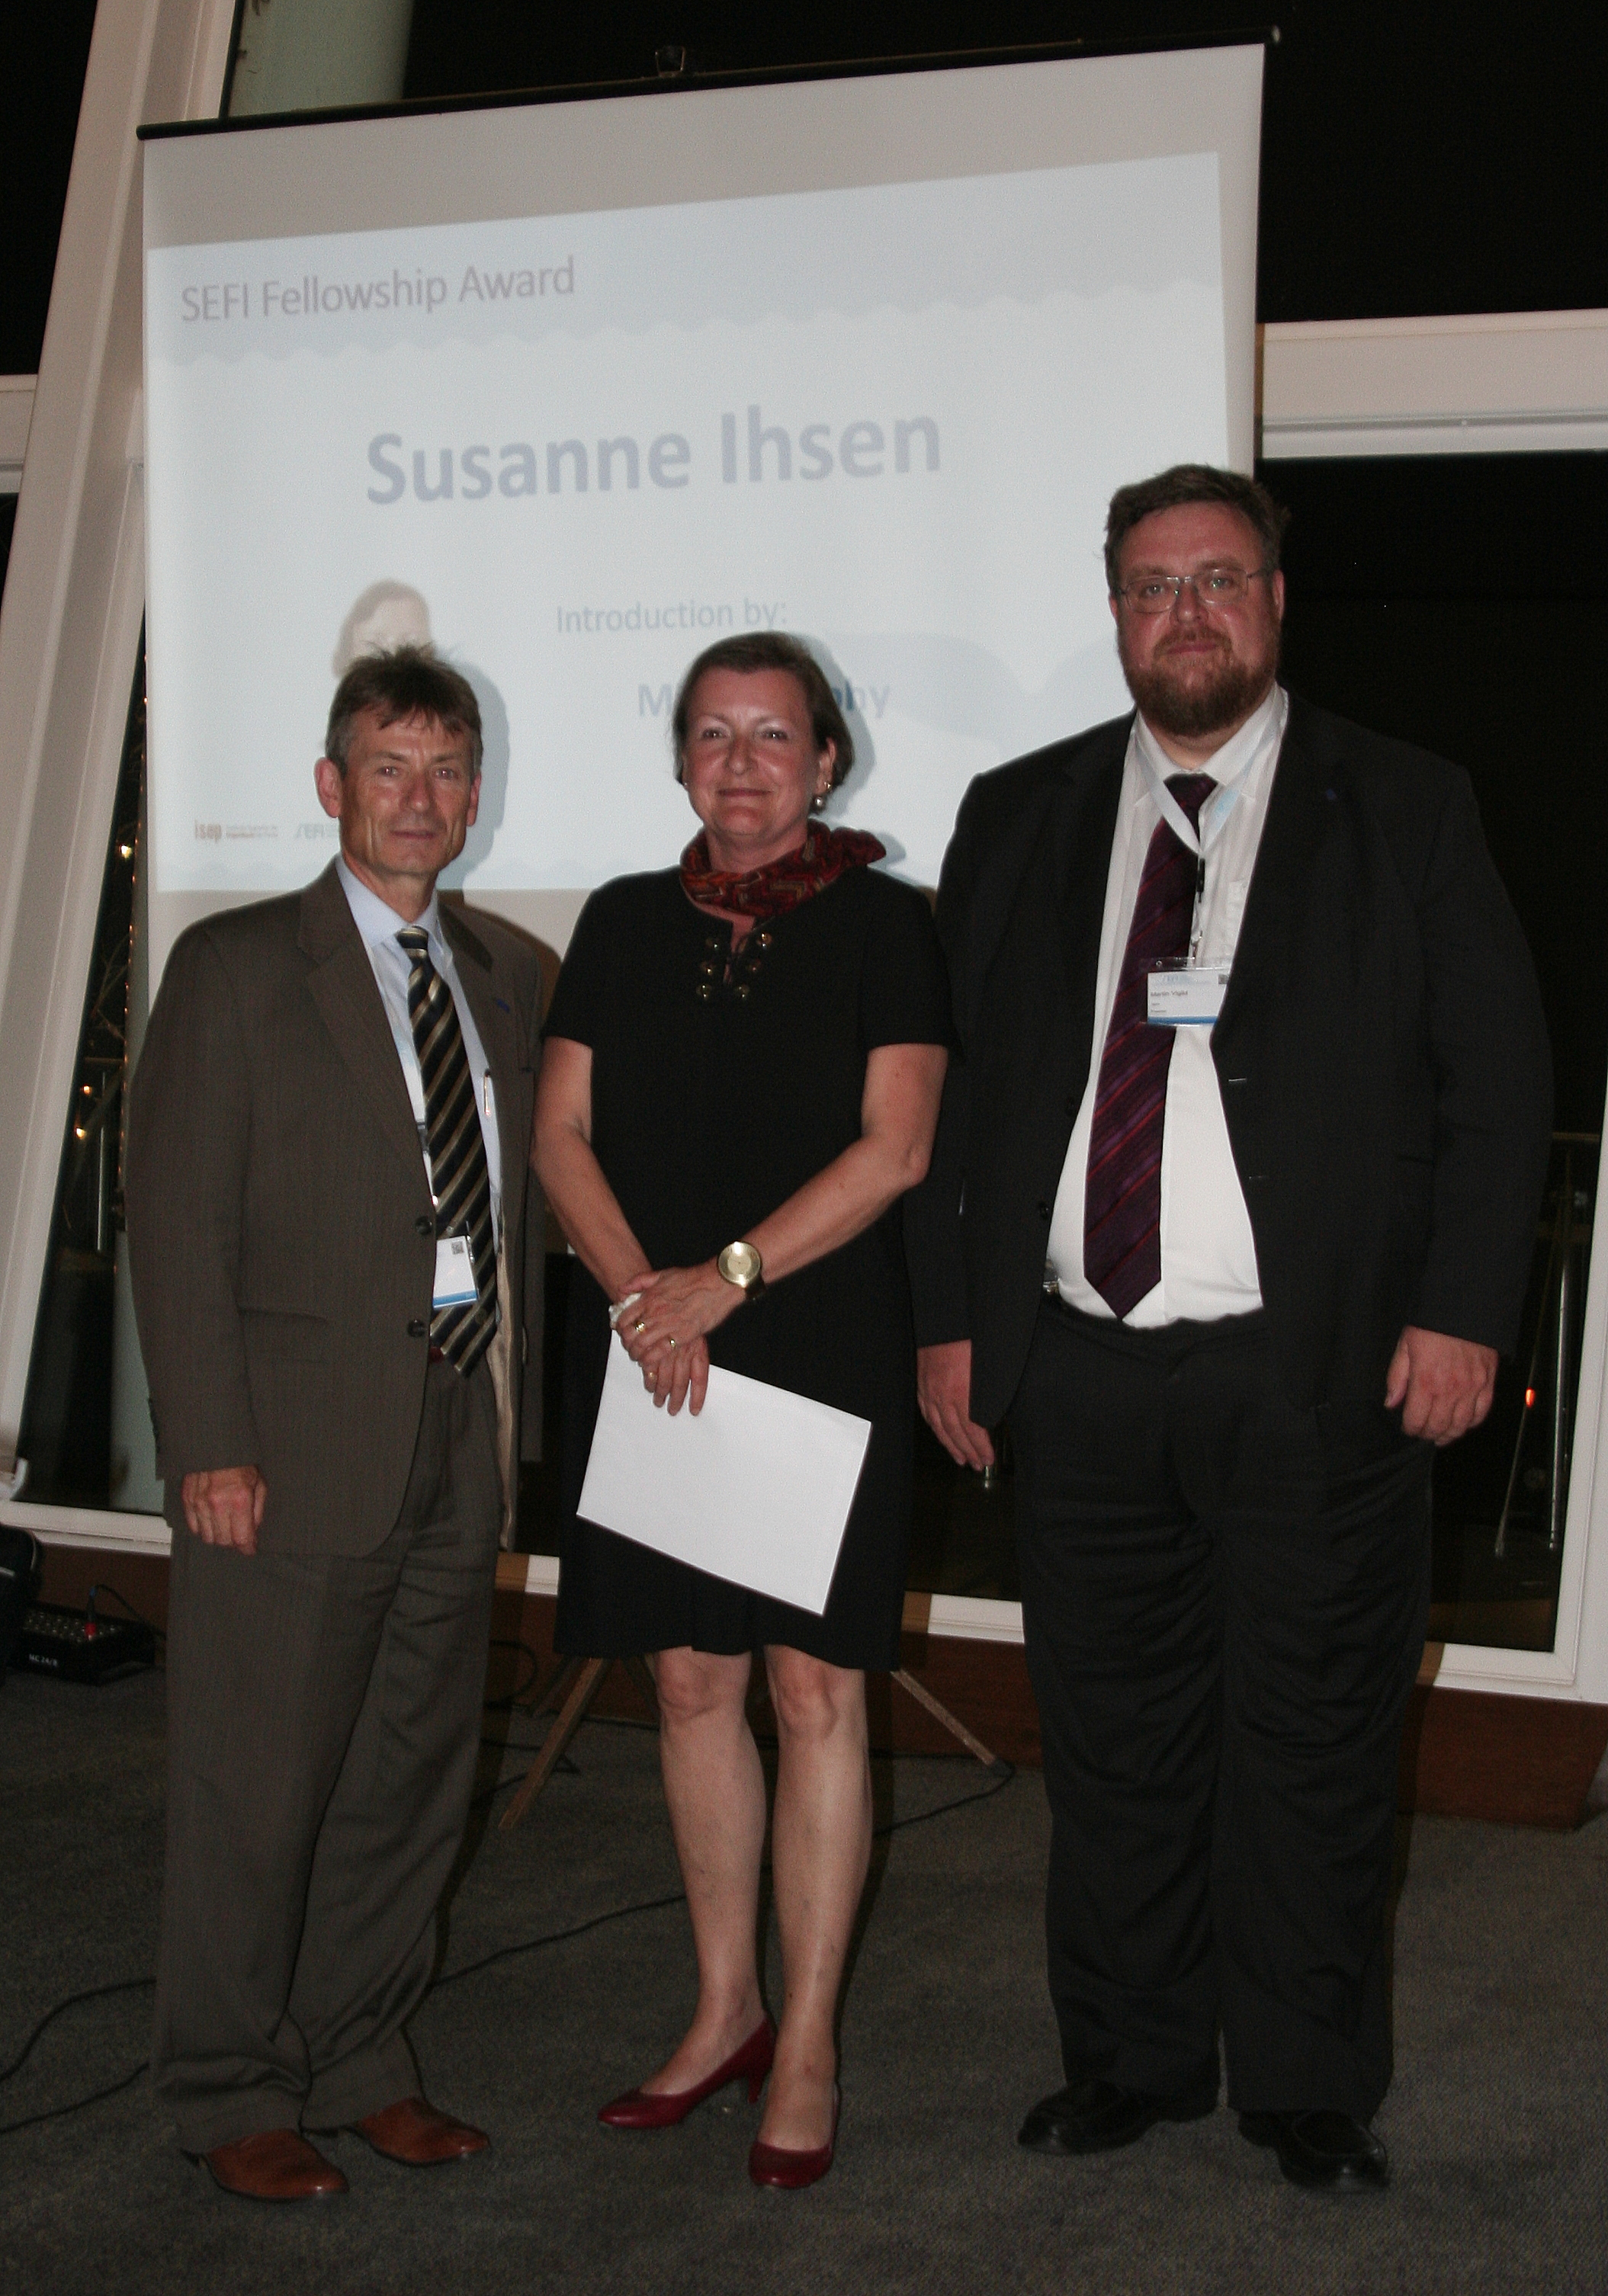 SEFI Fellowship Award: Susanne Ihsen